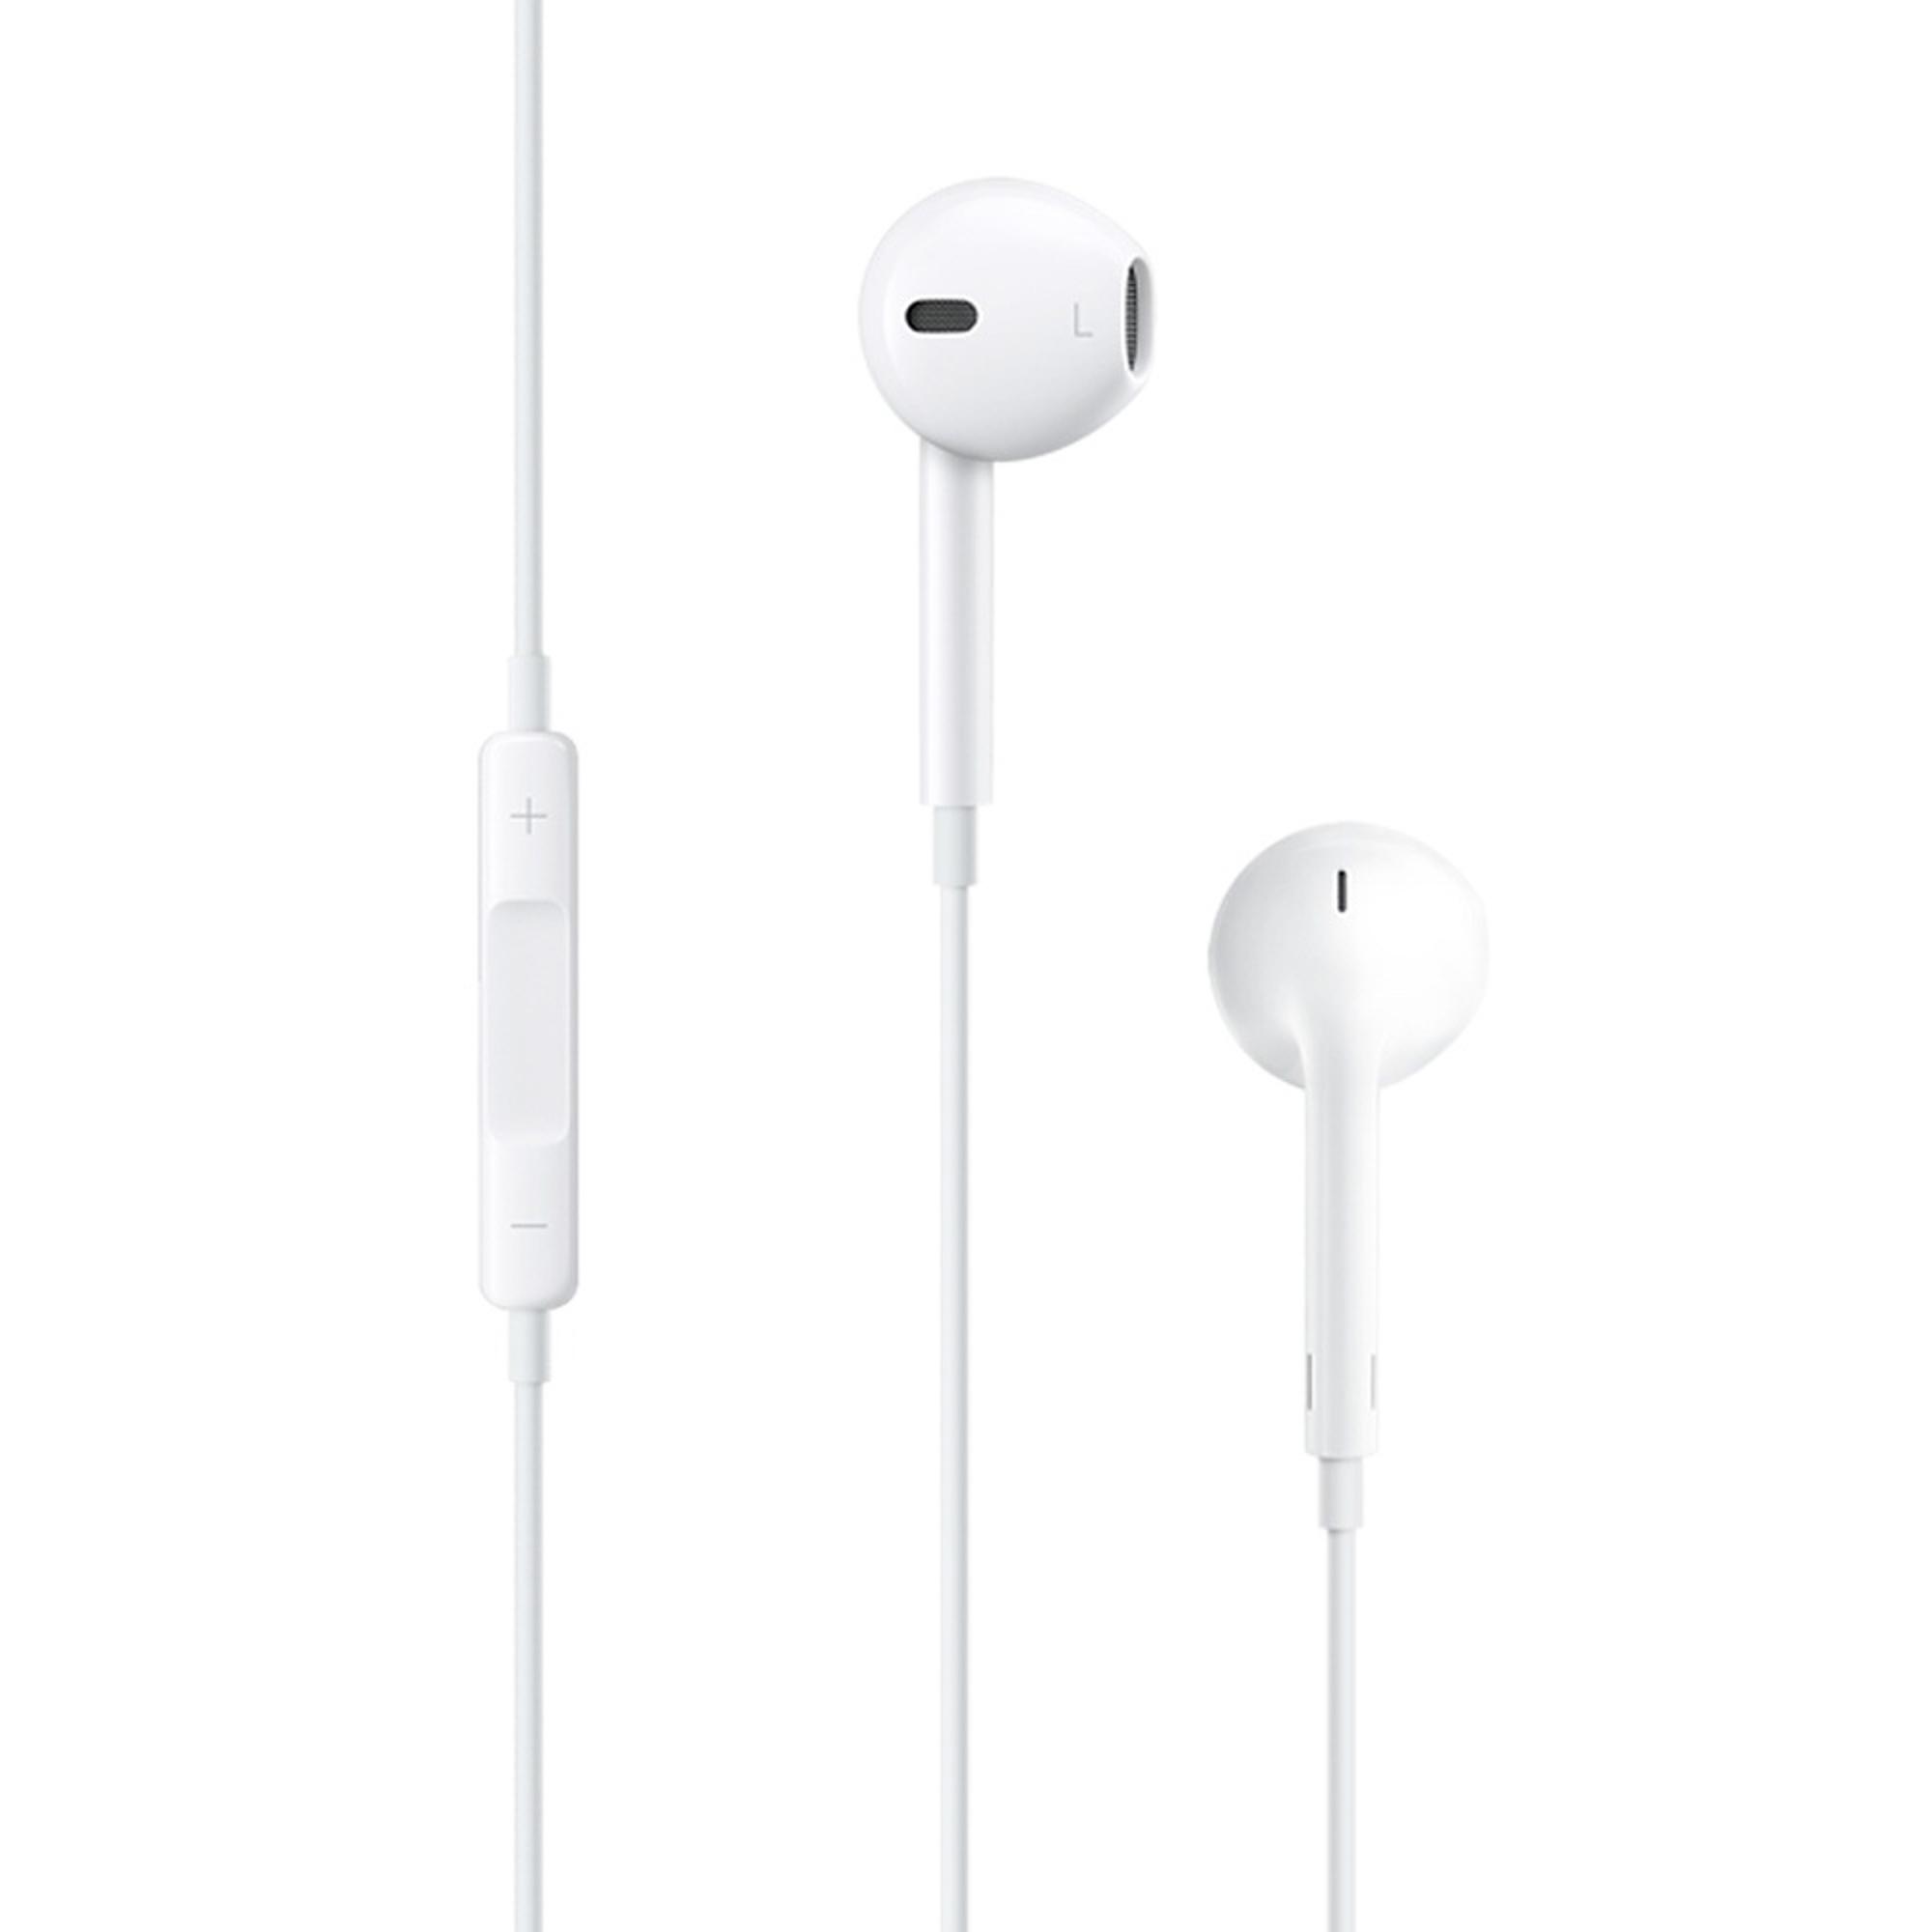 Наушники-вкладыши Apple EarPods с разъёмом Lightning White